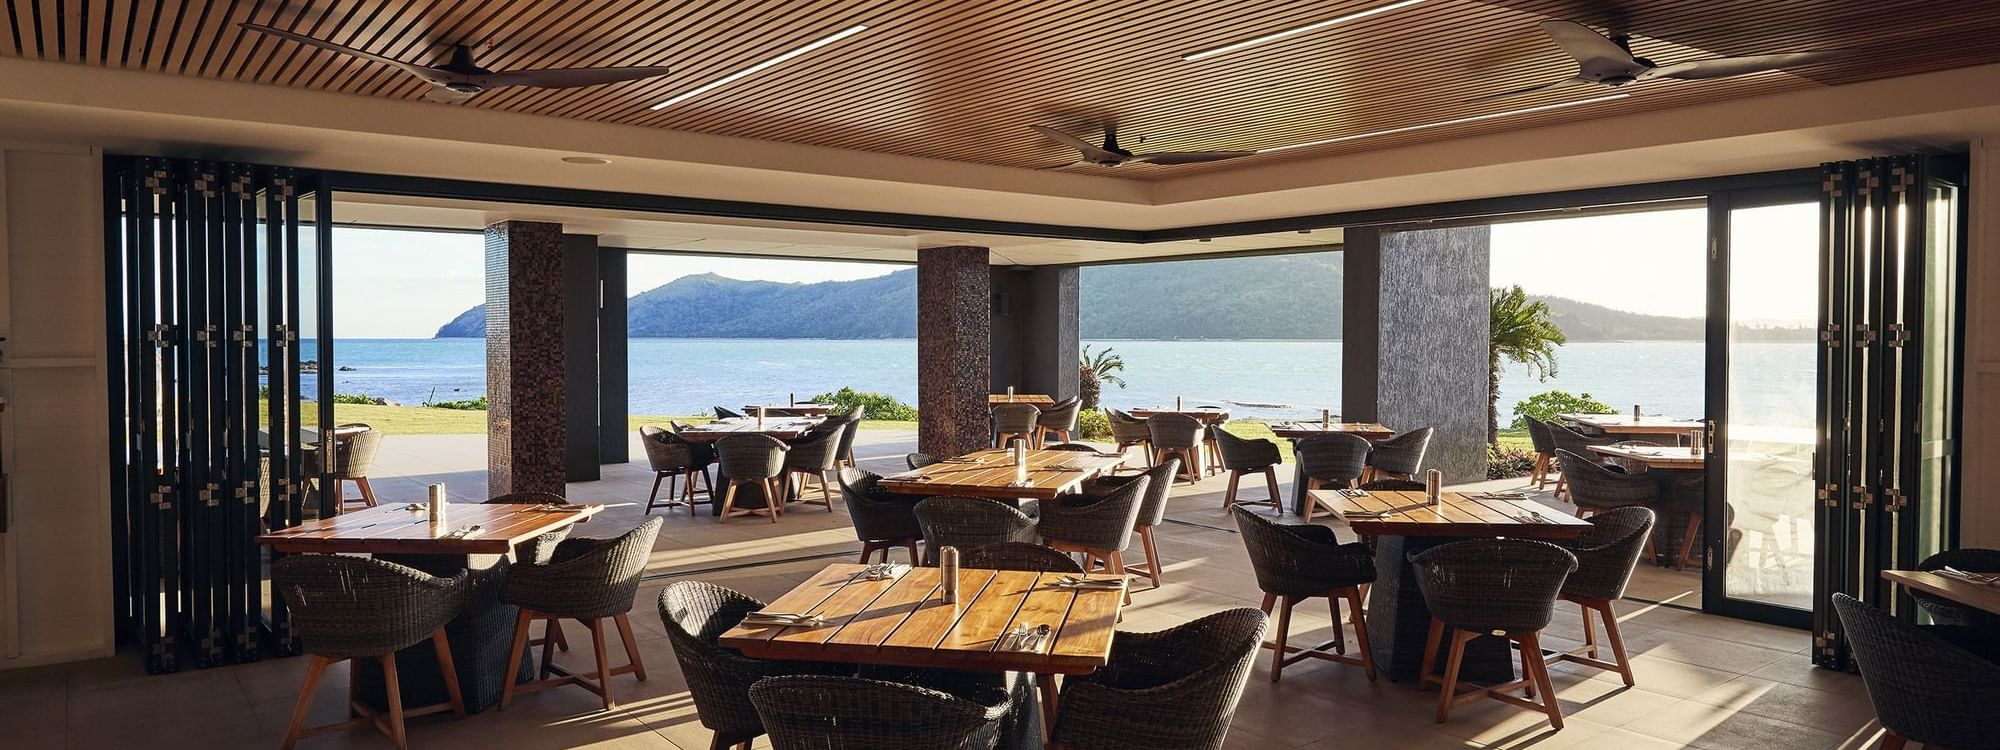 Dining area in Inkstone Kitchen & Bar at Daydream Island Resort